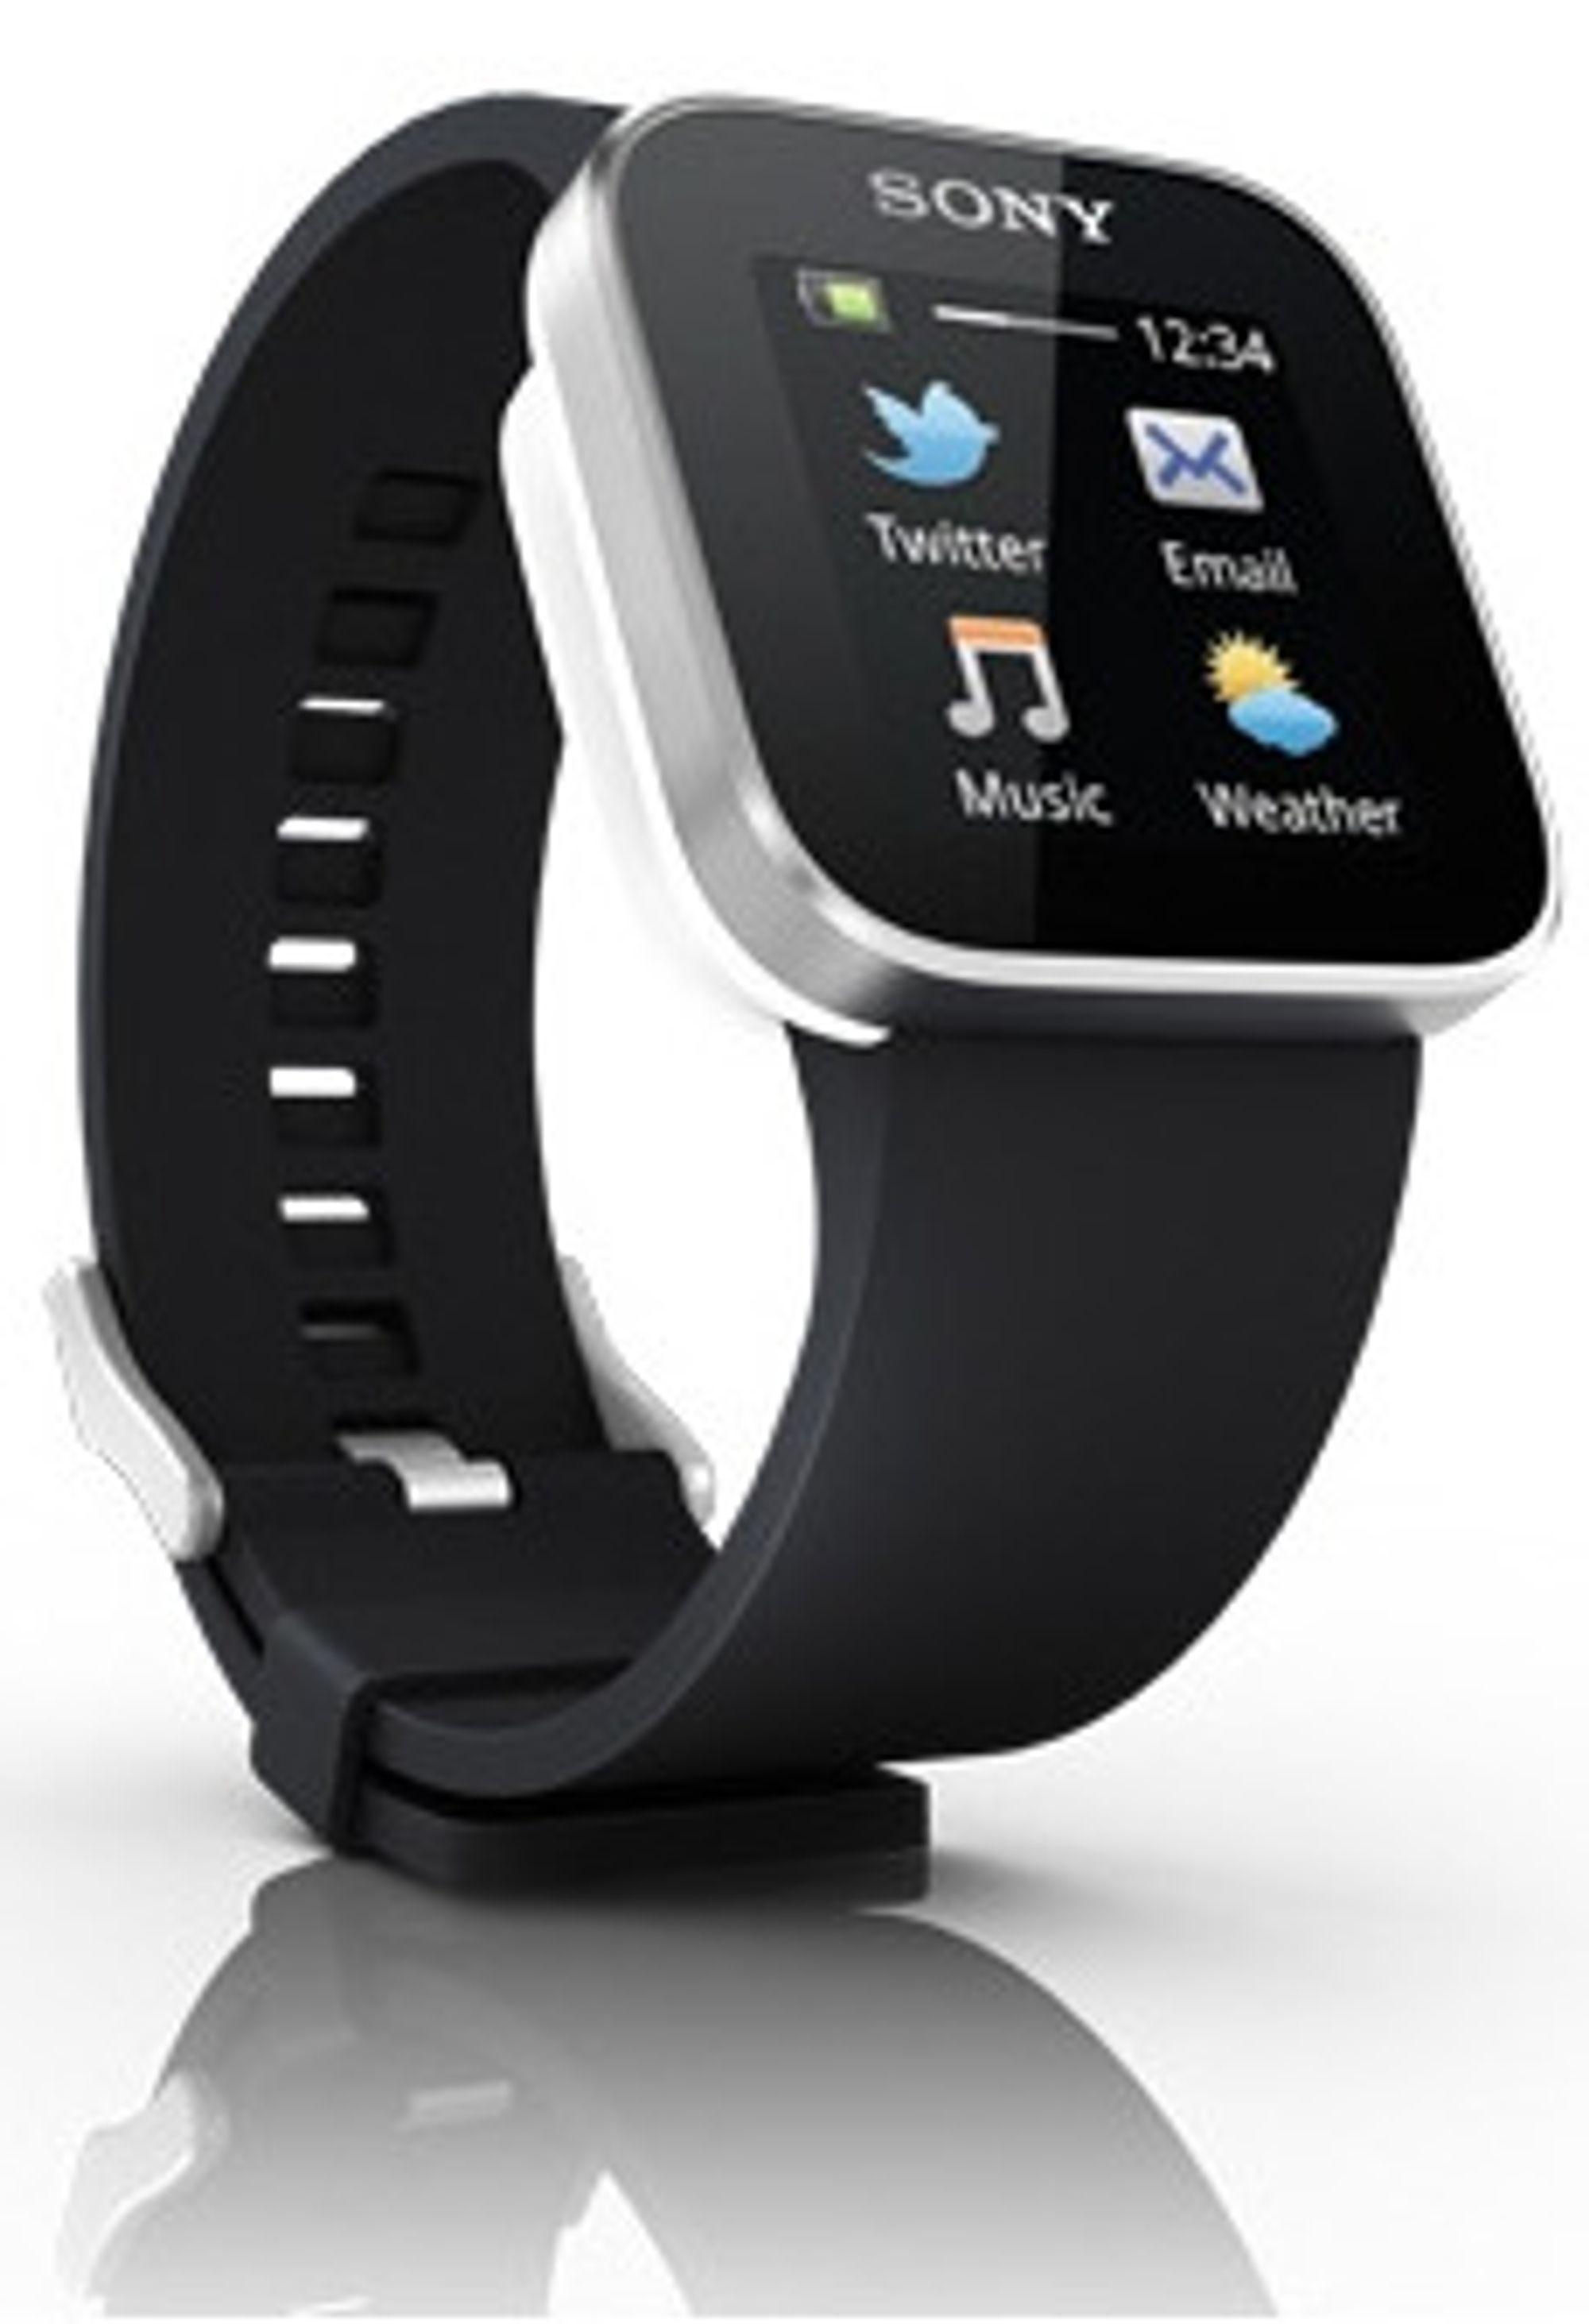 Sony lanserte sin SmartWatch i januar 2012.